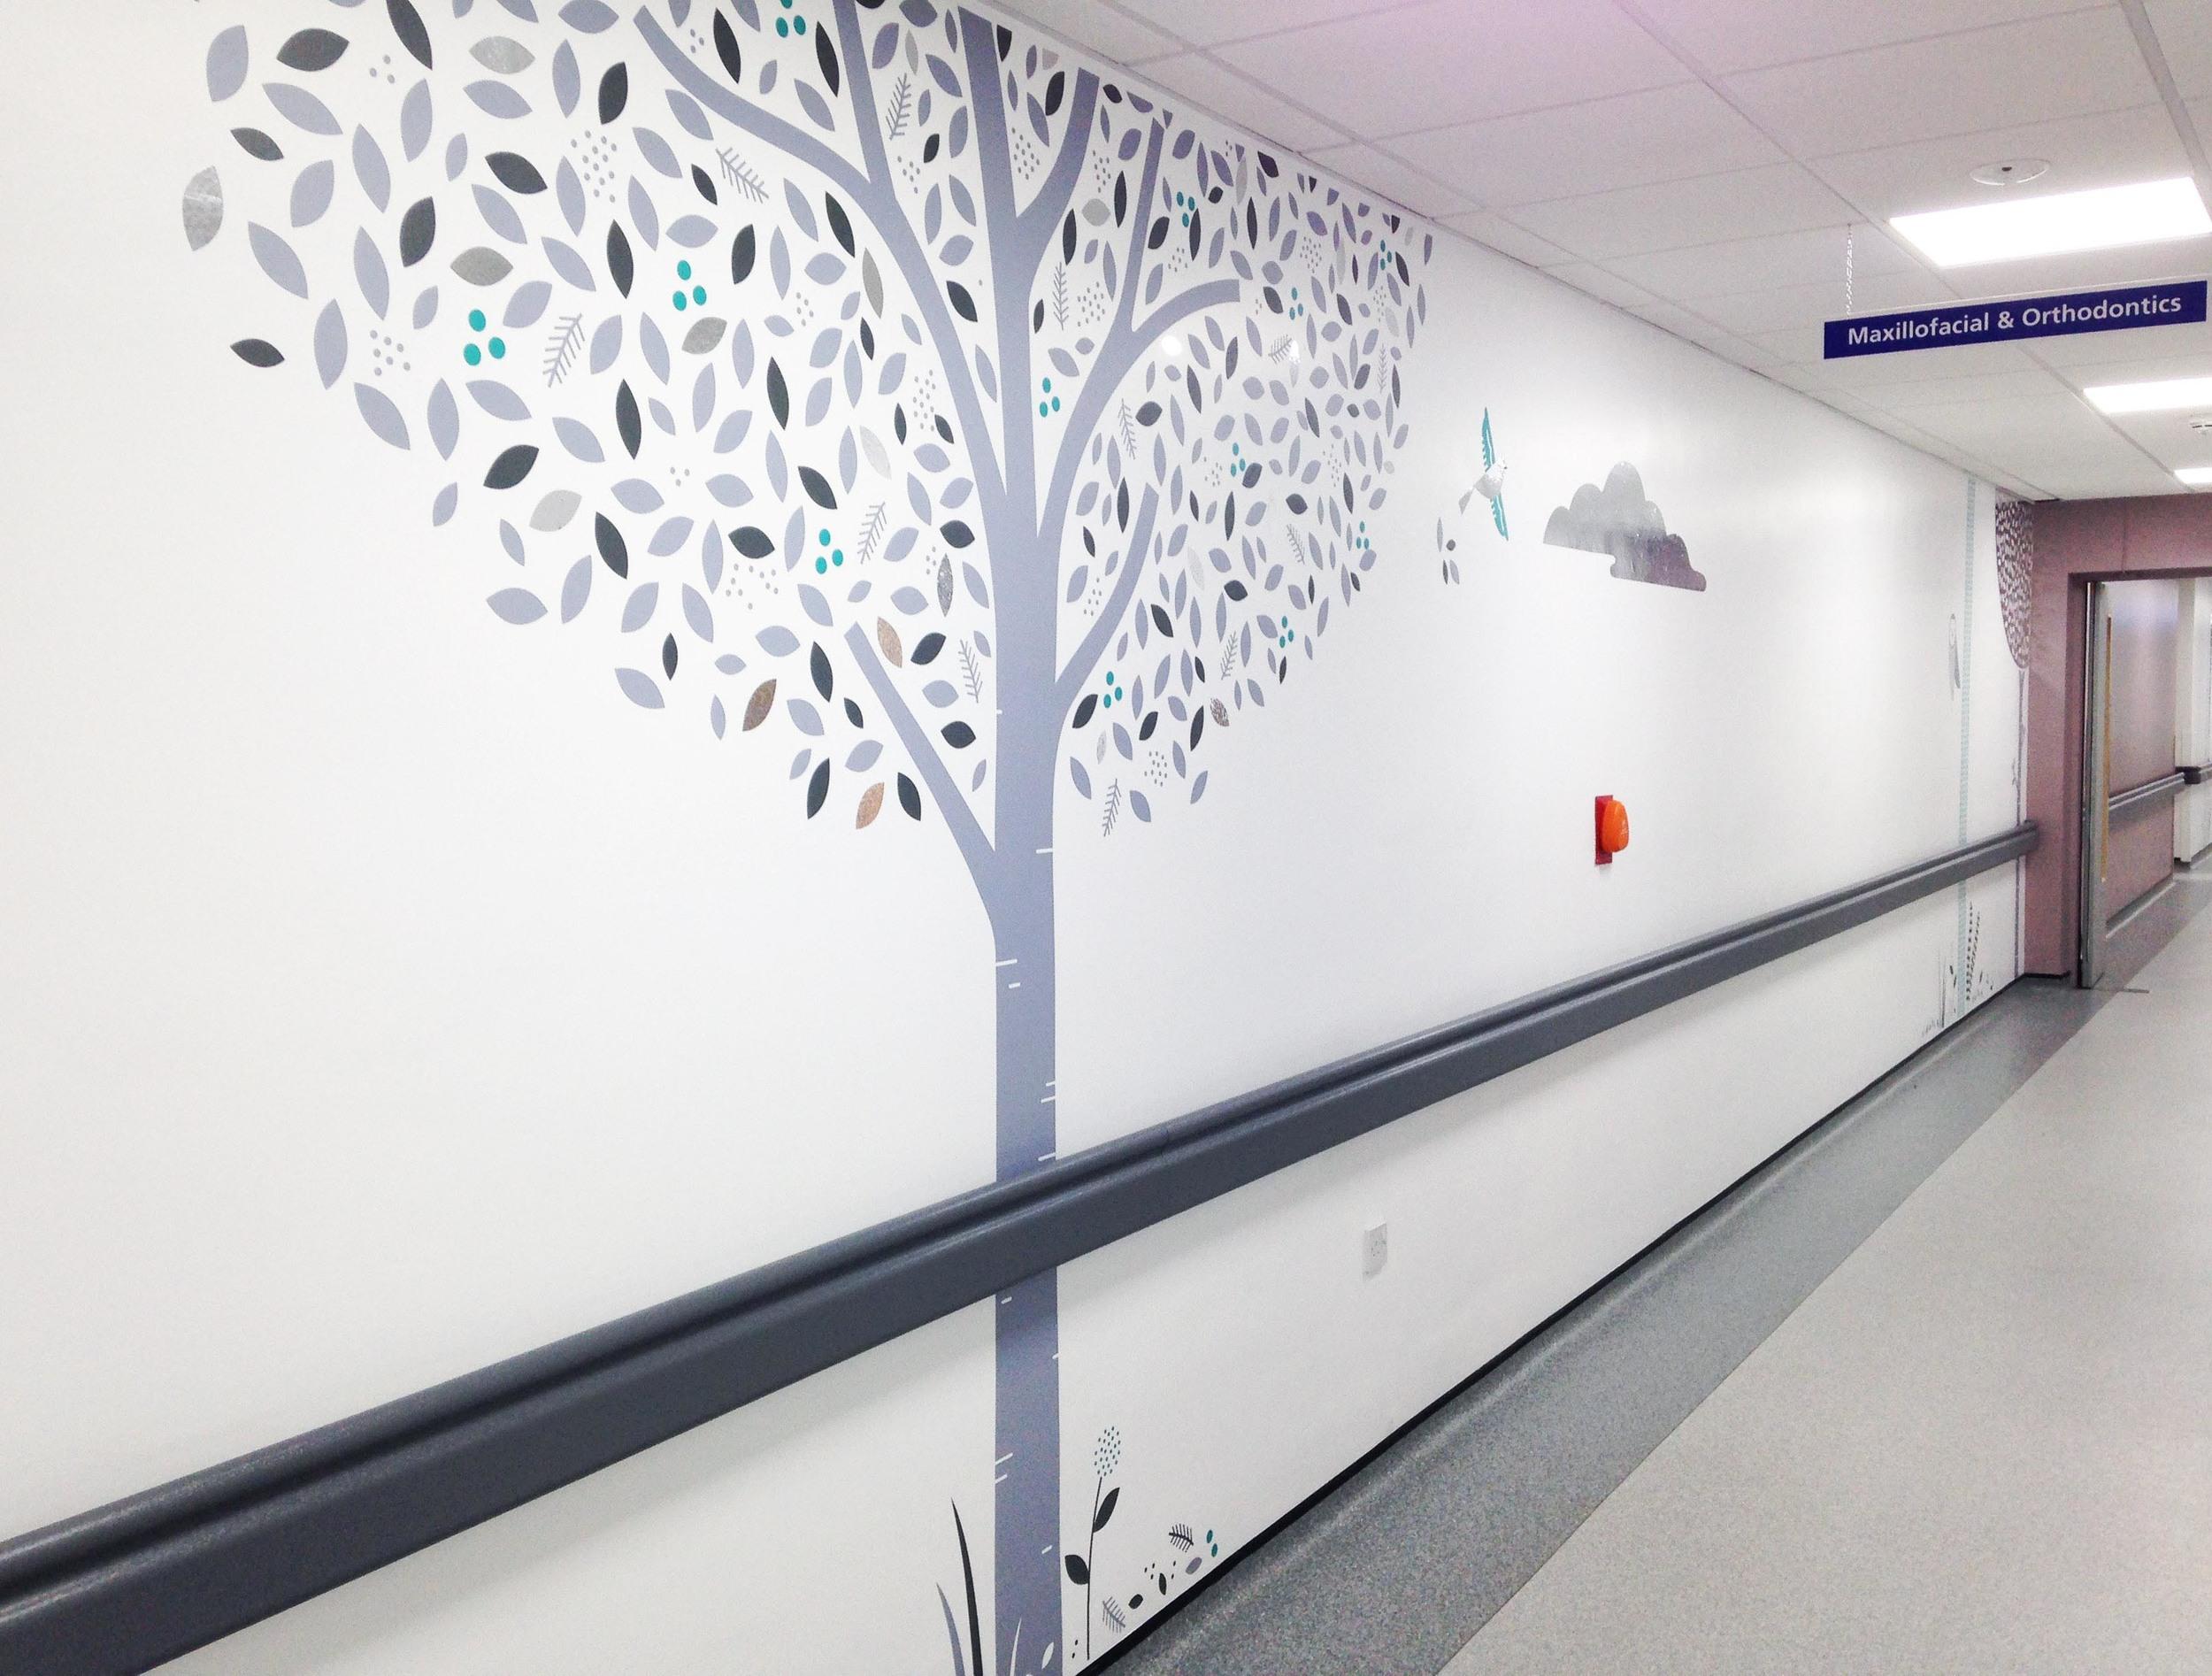 Fracture Corridor Photo 2-hospital-illustration-wall-graphics.jpg